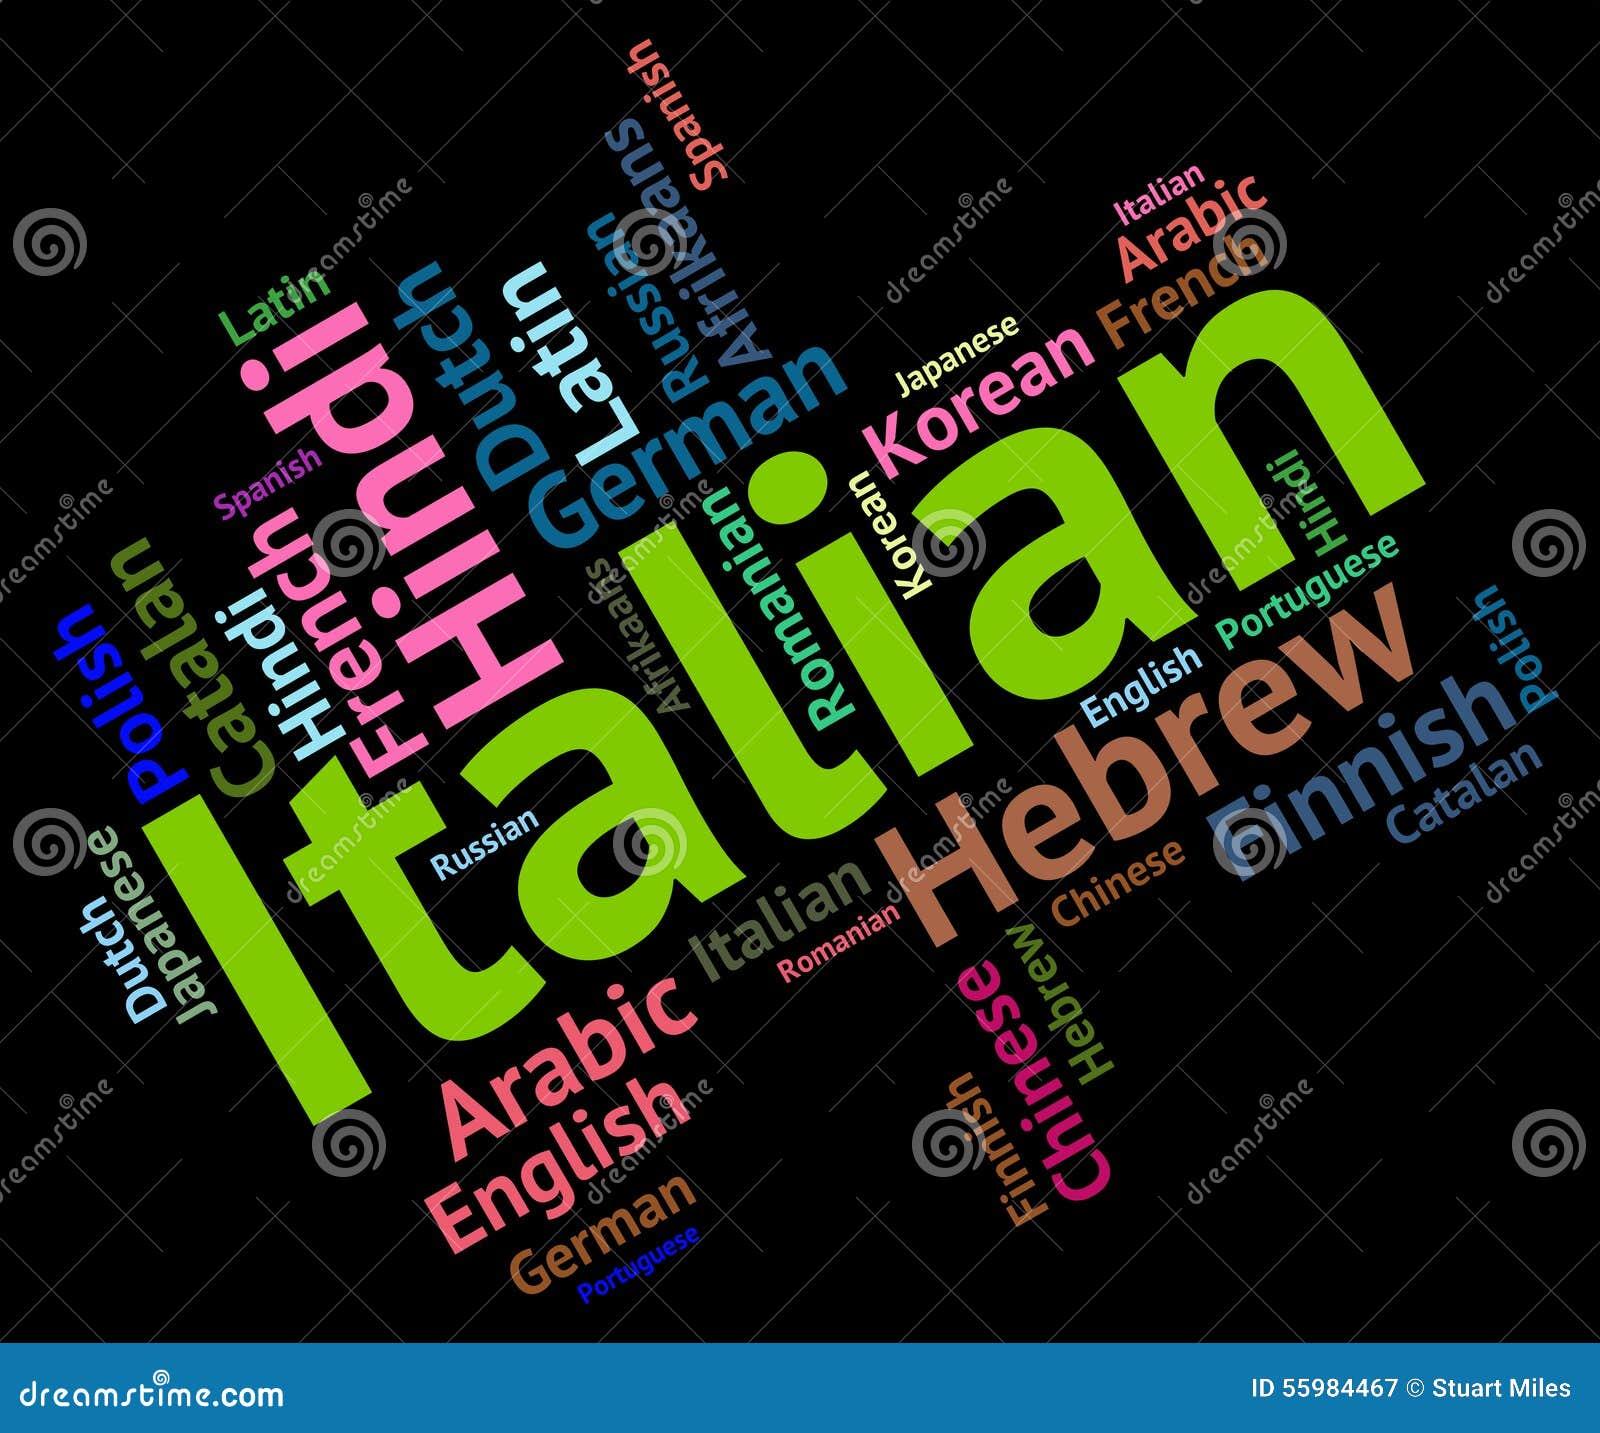 Italian Language Translation To English: Italian Language Shows Foreign Translate And Vocabulary